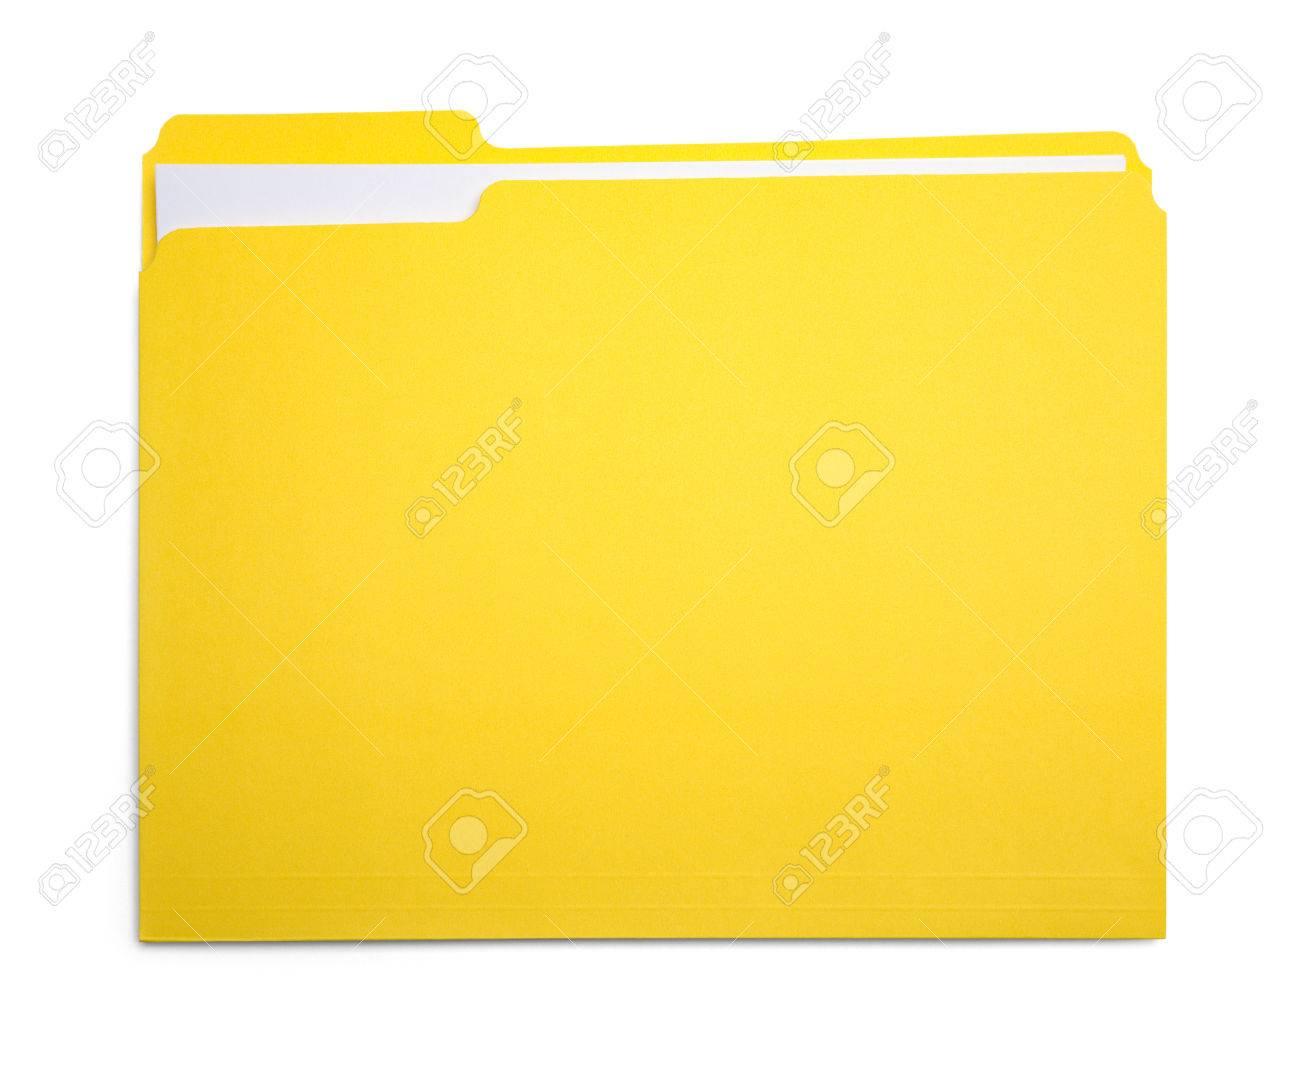 Closed Yellow File Folder Isolated on White Background. - 84062805